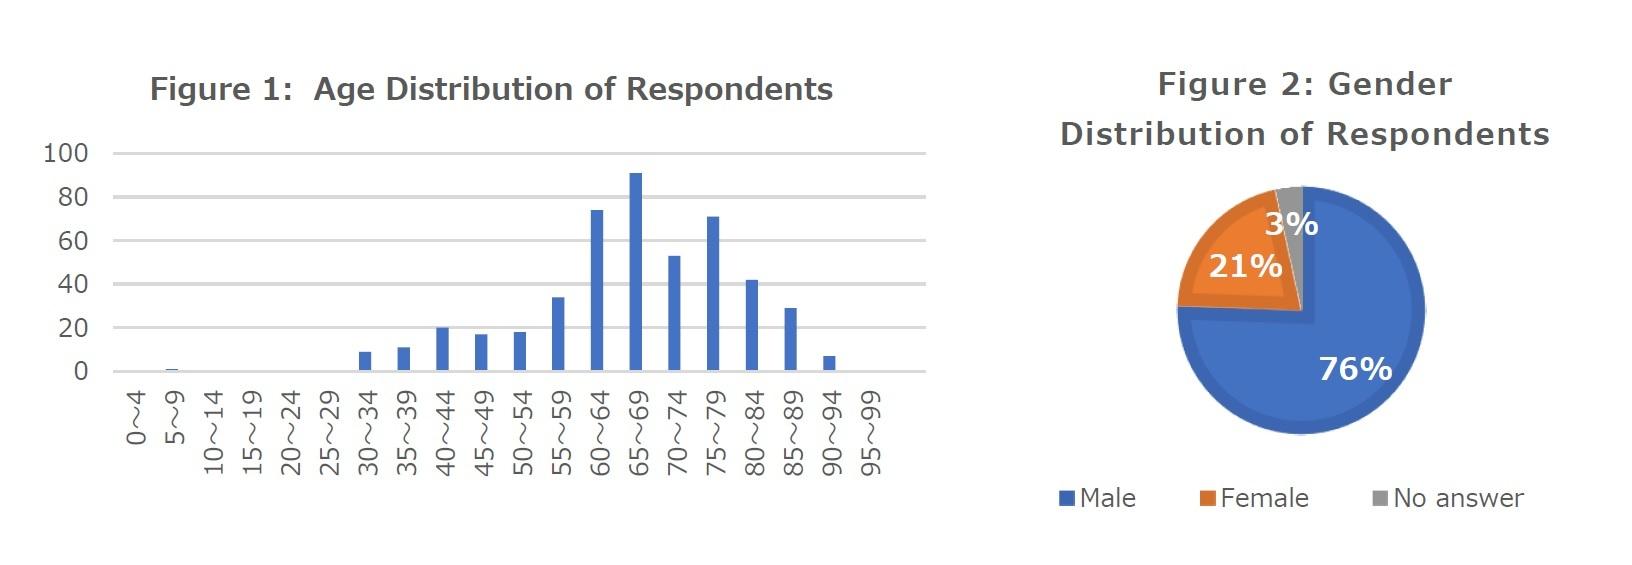 Figure 1: Age Distribution of Respondents/Figure 2: Gender  Distribution of Respondents